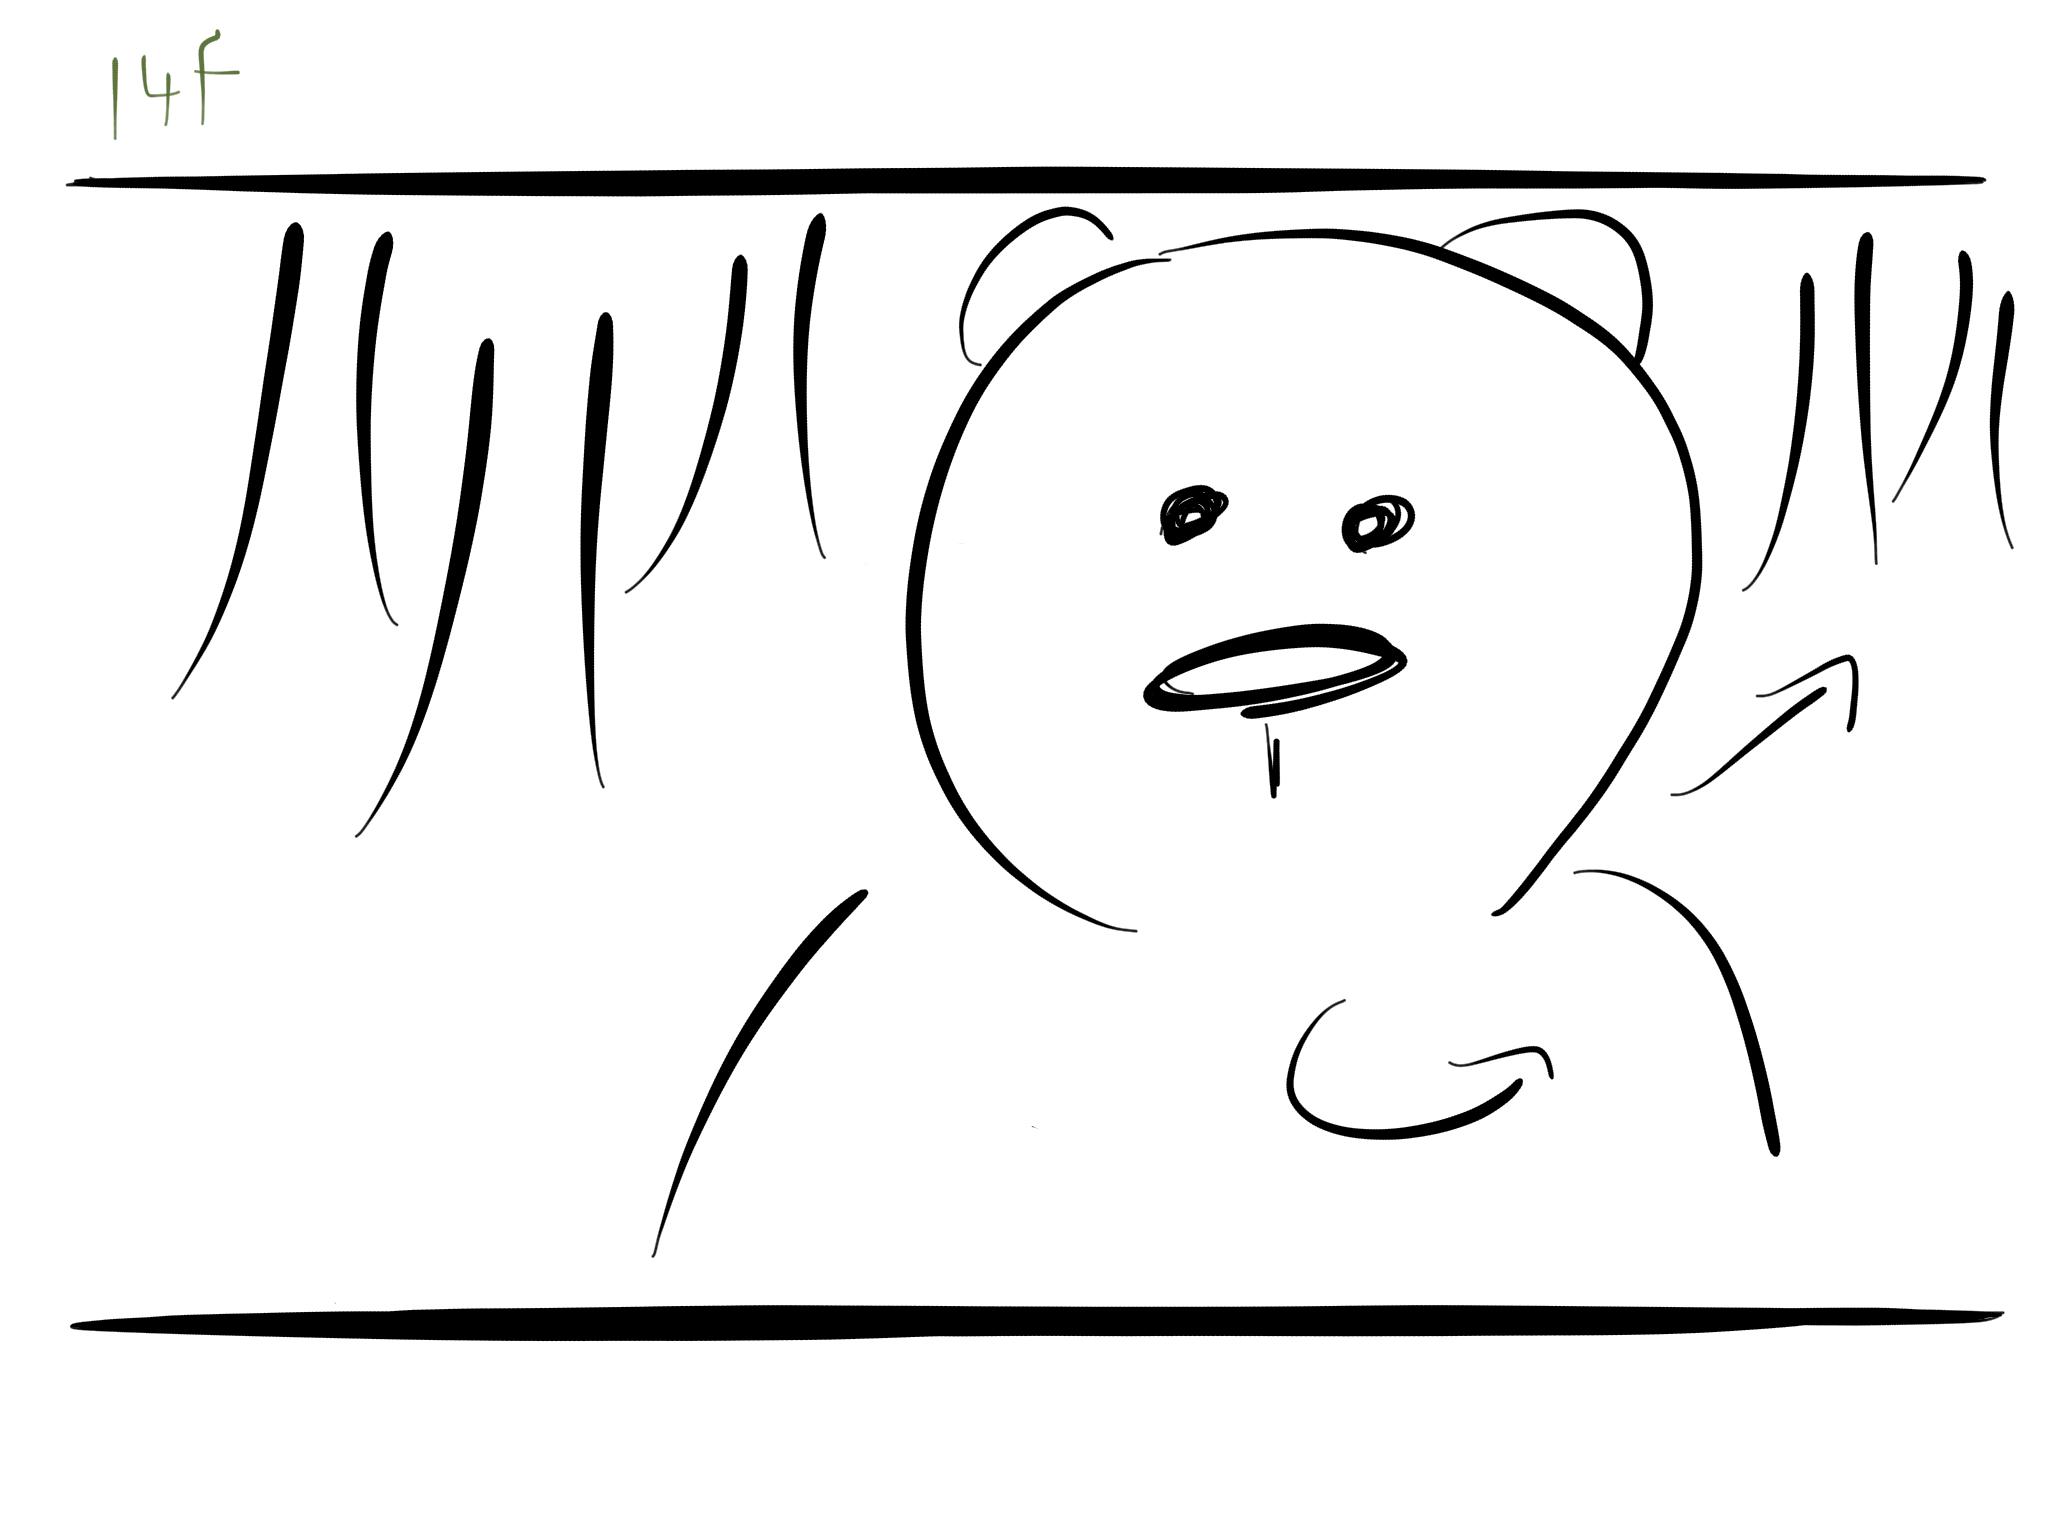 BDF_Storyboards_58.jpg